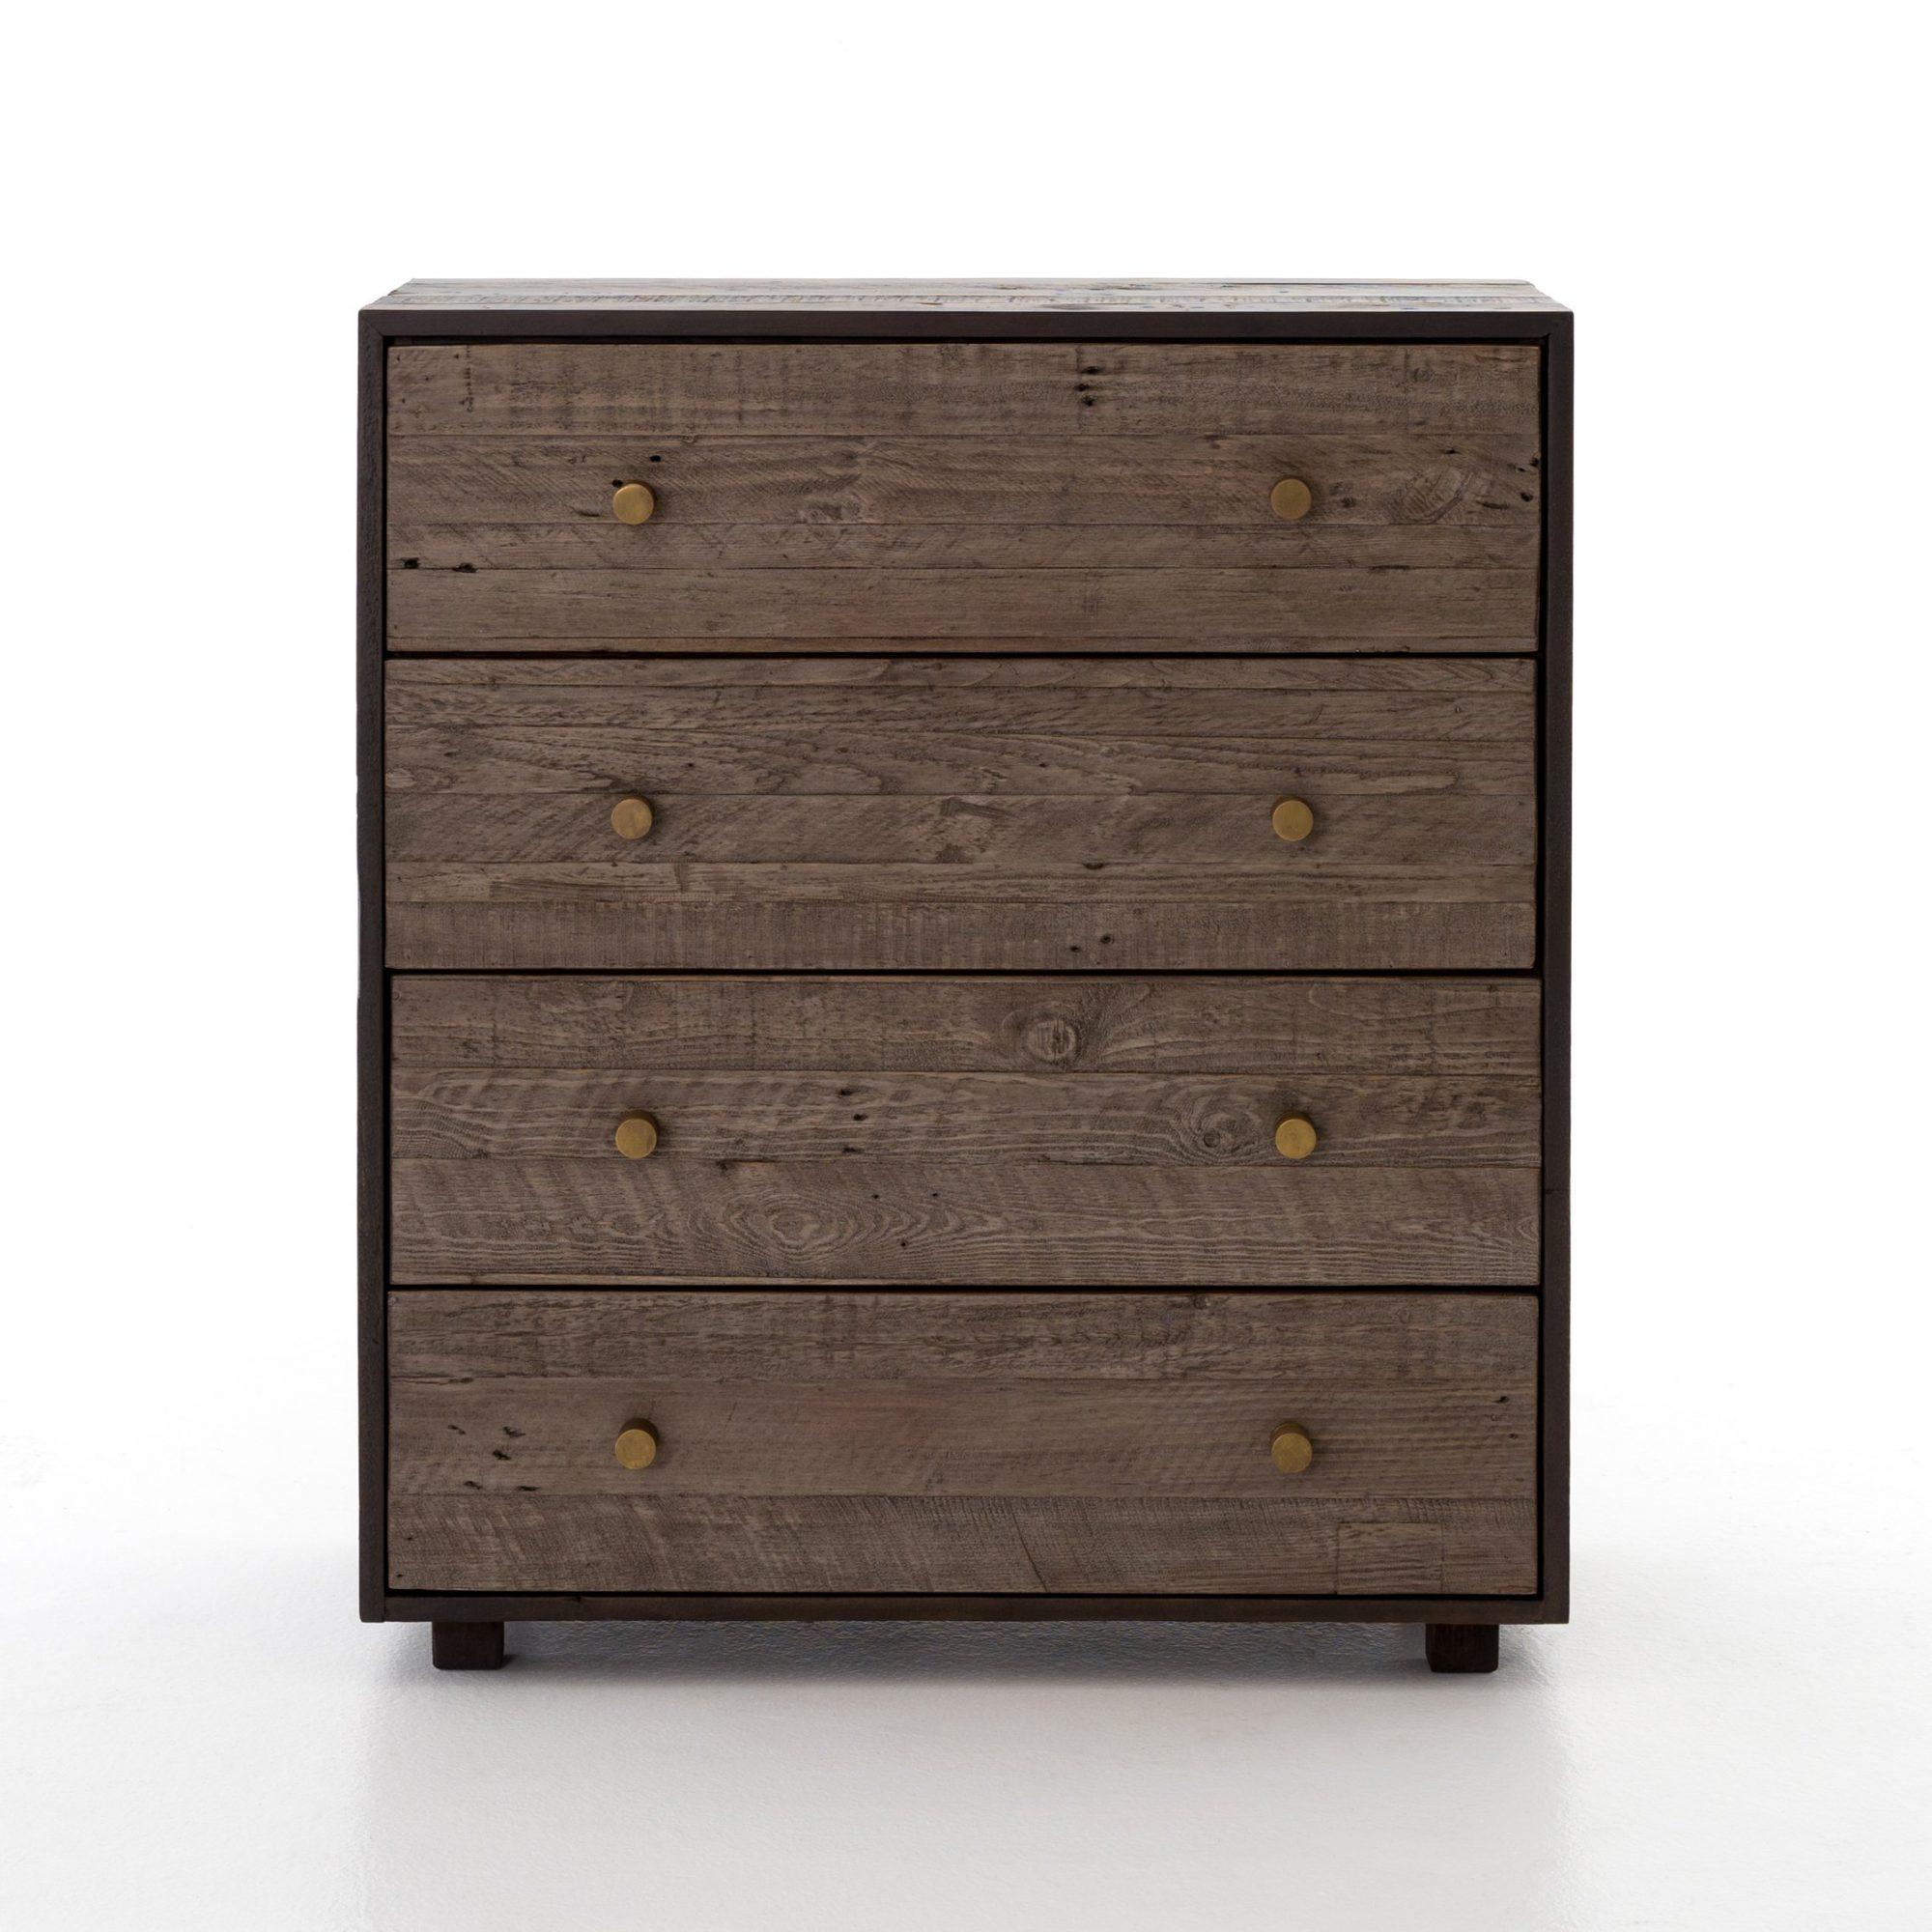 Calais 4 Drawer Dresser in Rustic Brown